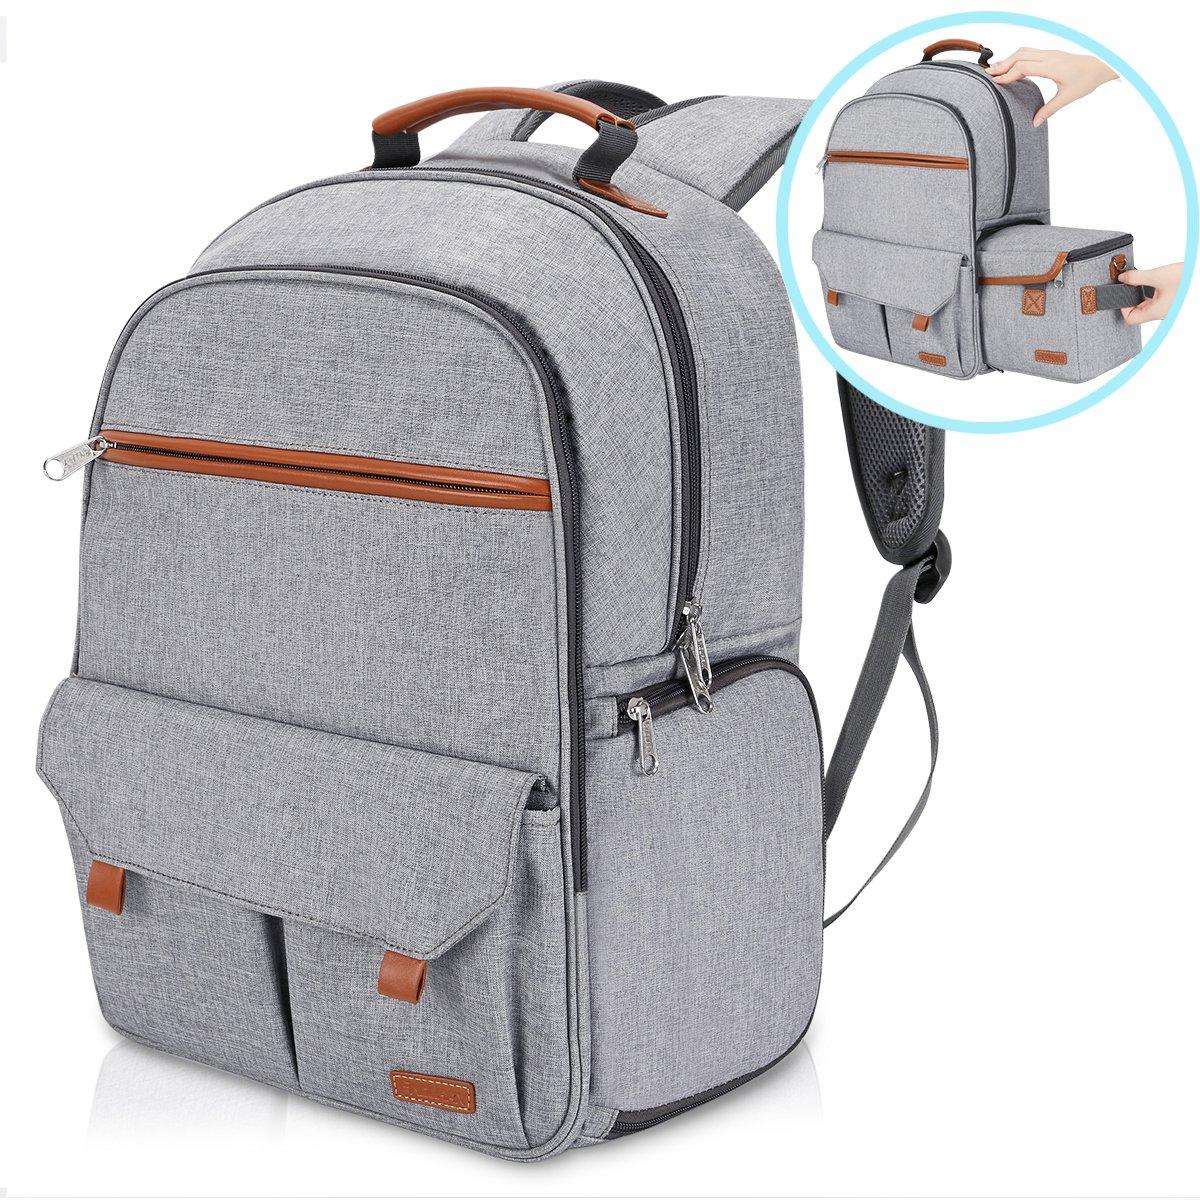 Endurax Waterproof Camera Backpack for Women and Men Fits 15.6'' Laptop with Build-in DSLR Shoulder Photographer Bag